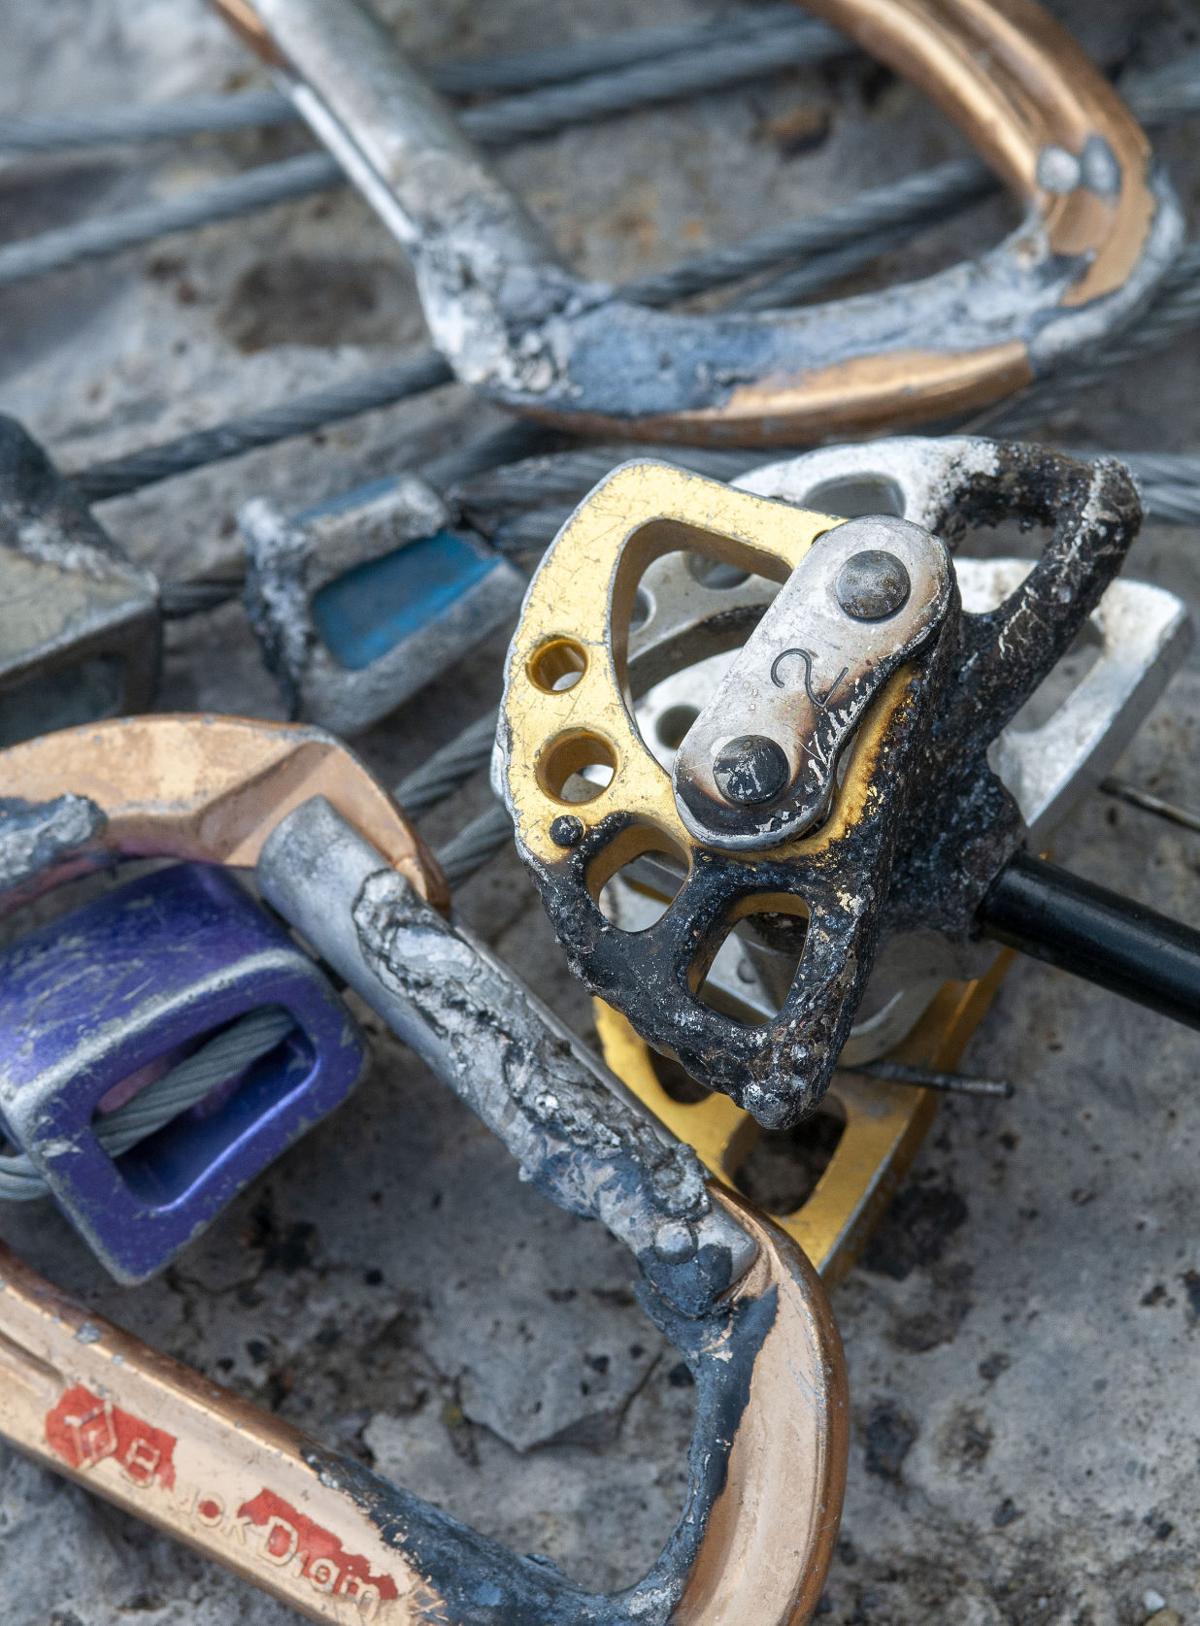 Climbing equipment damaged by Grand Teton lightning strikes in July 21, 2010